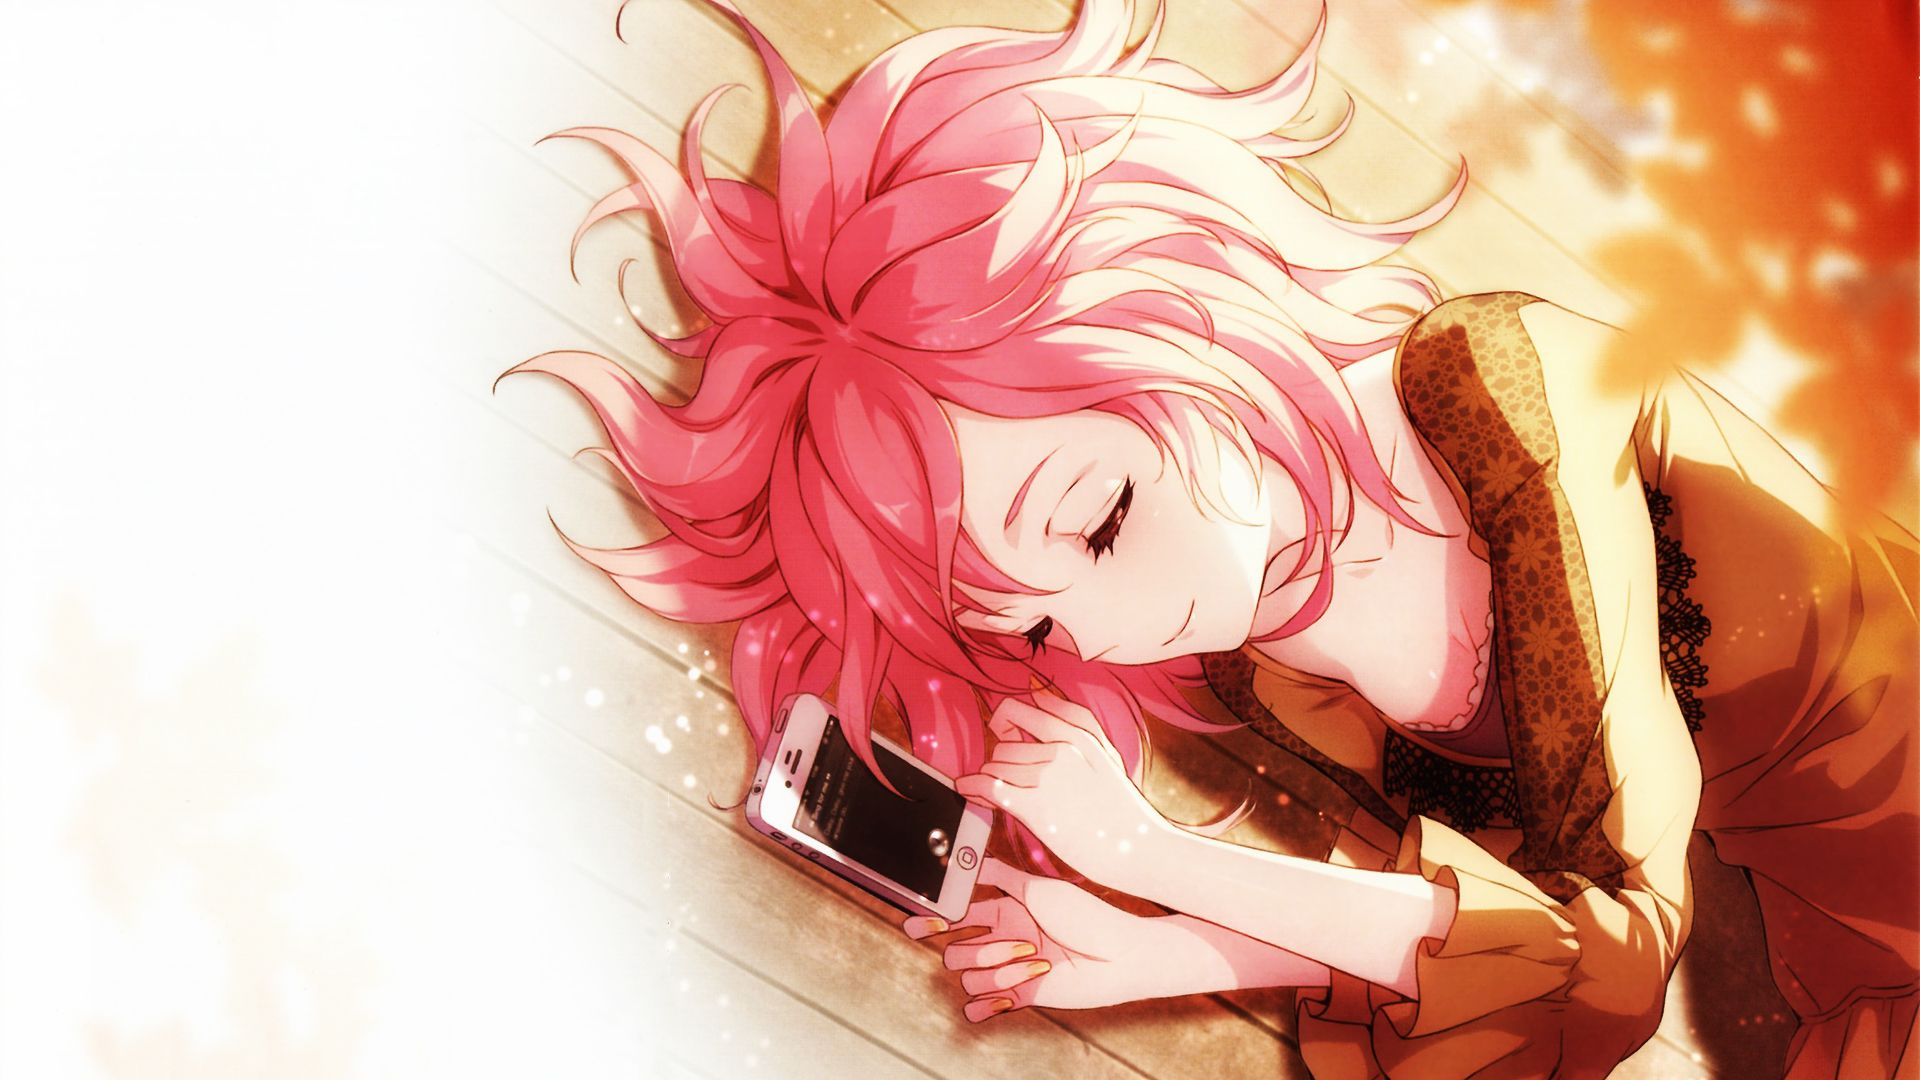 Anime Original Phone Mobile Pink Hair Pretty Female Anime Wallpaper